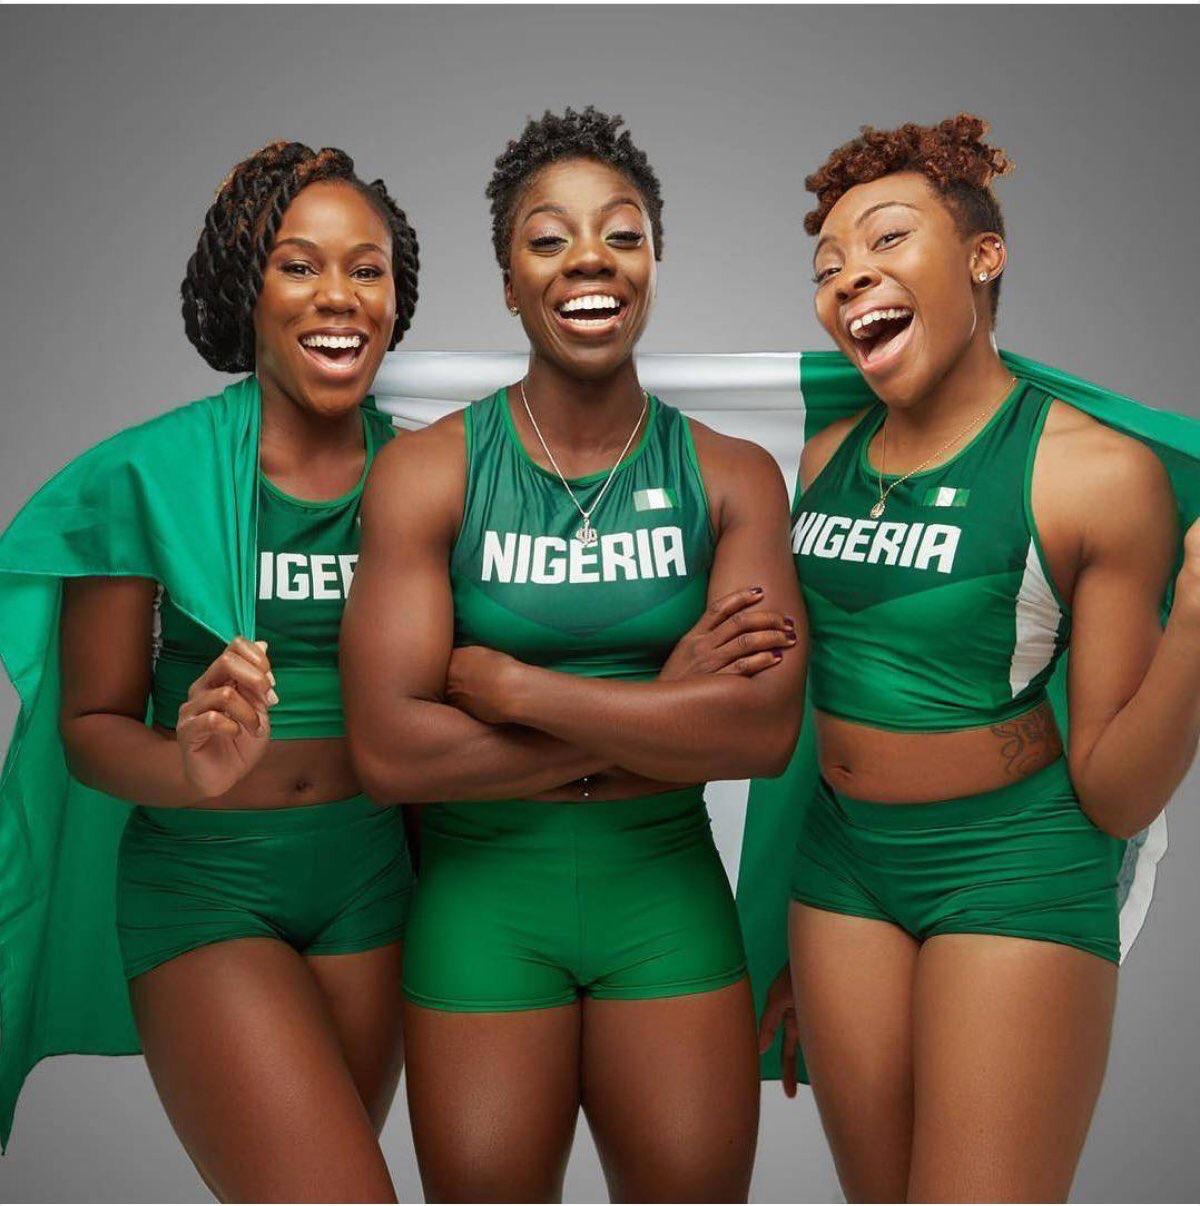 nigeria bobsled.jpg